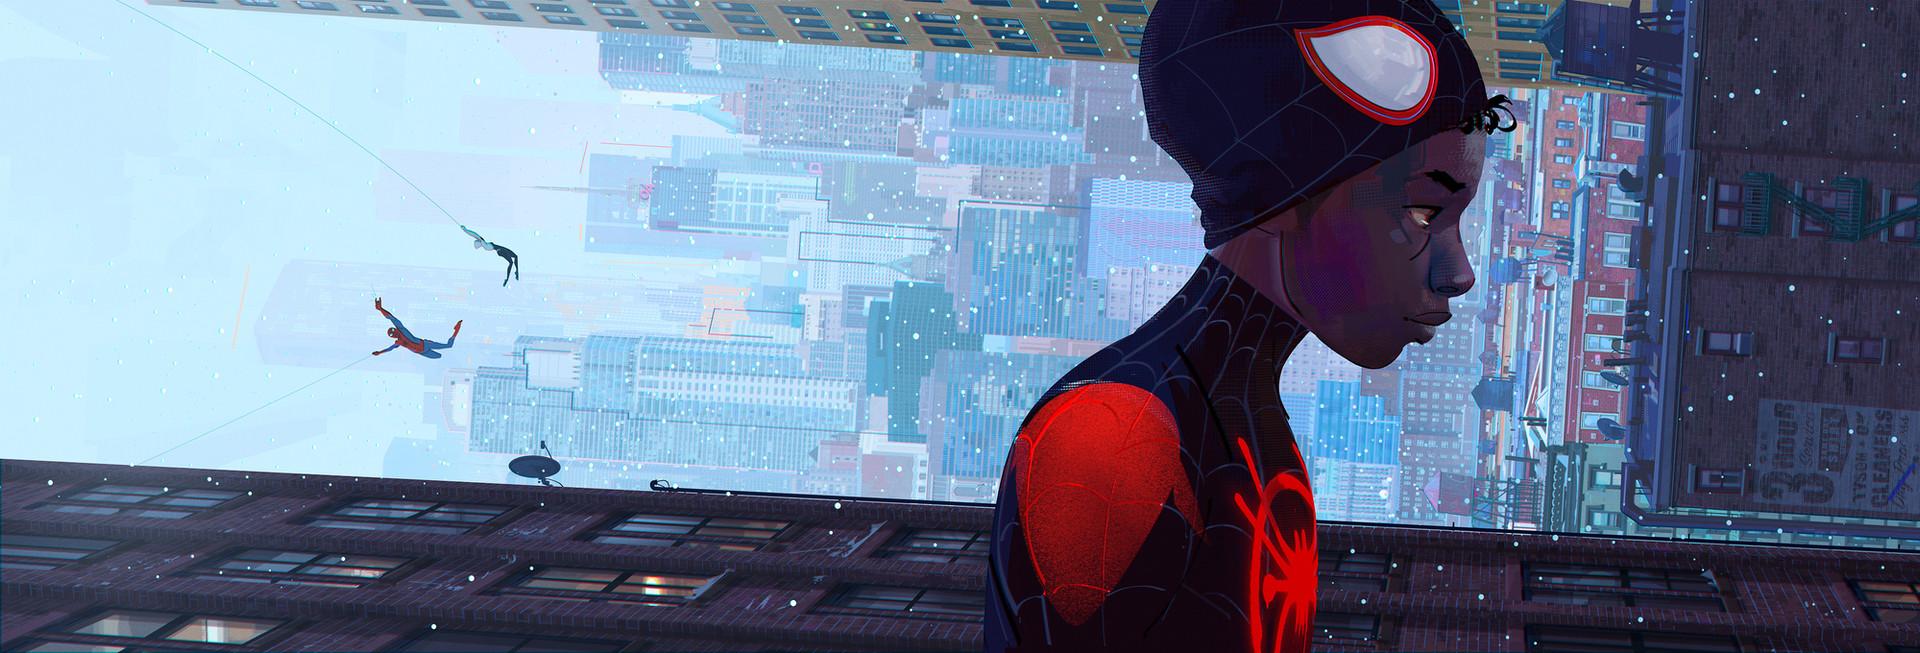 SpiderVerse_COVER_final_OK.jpg